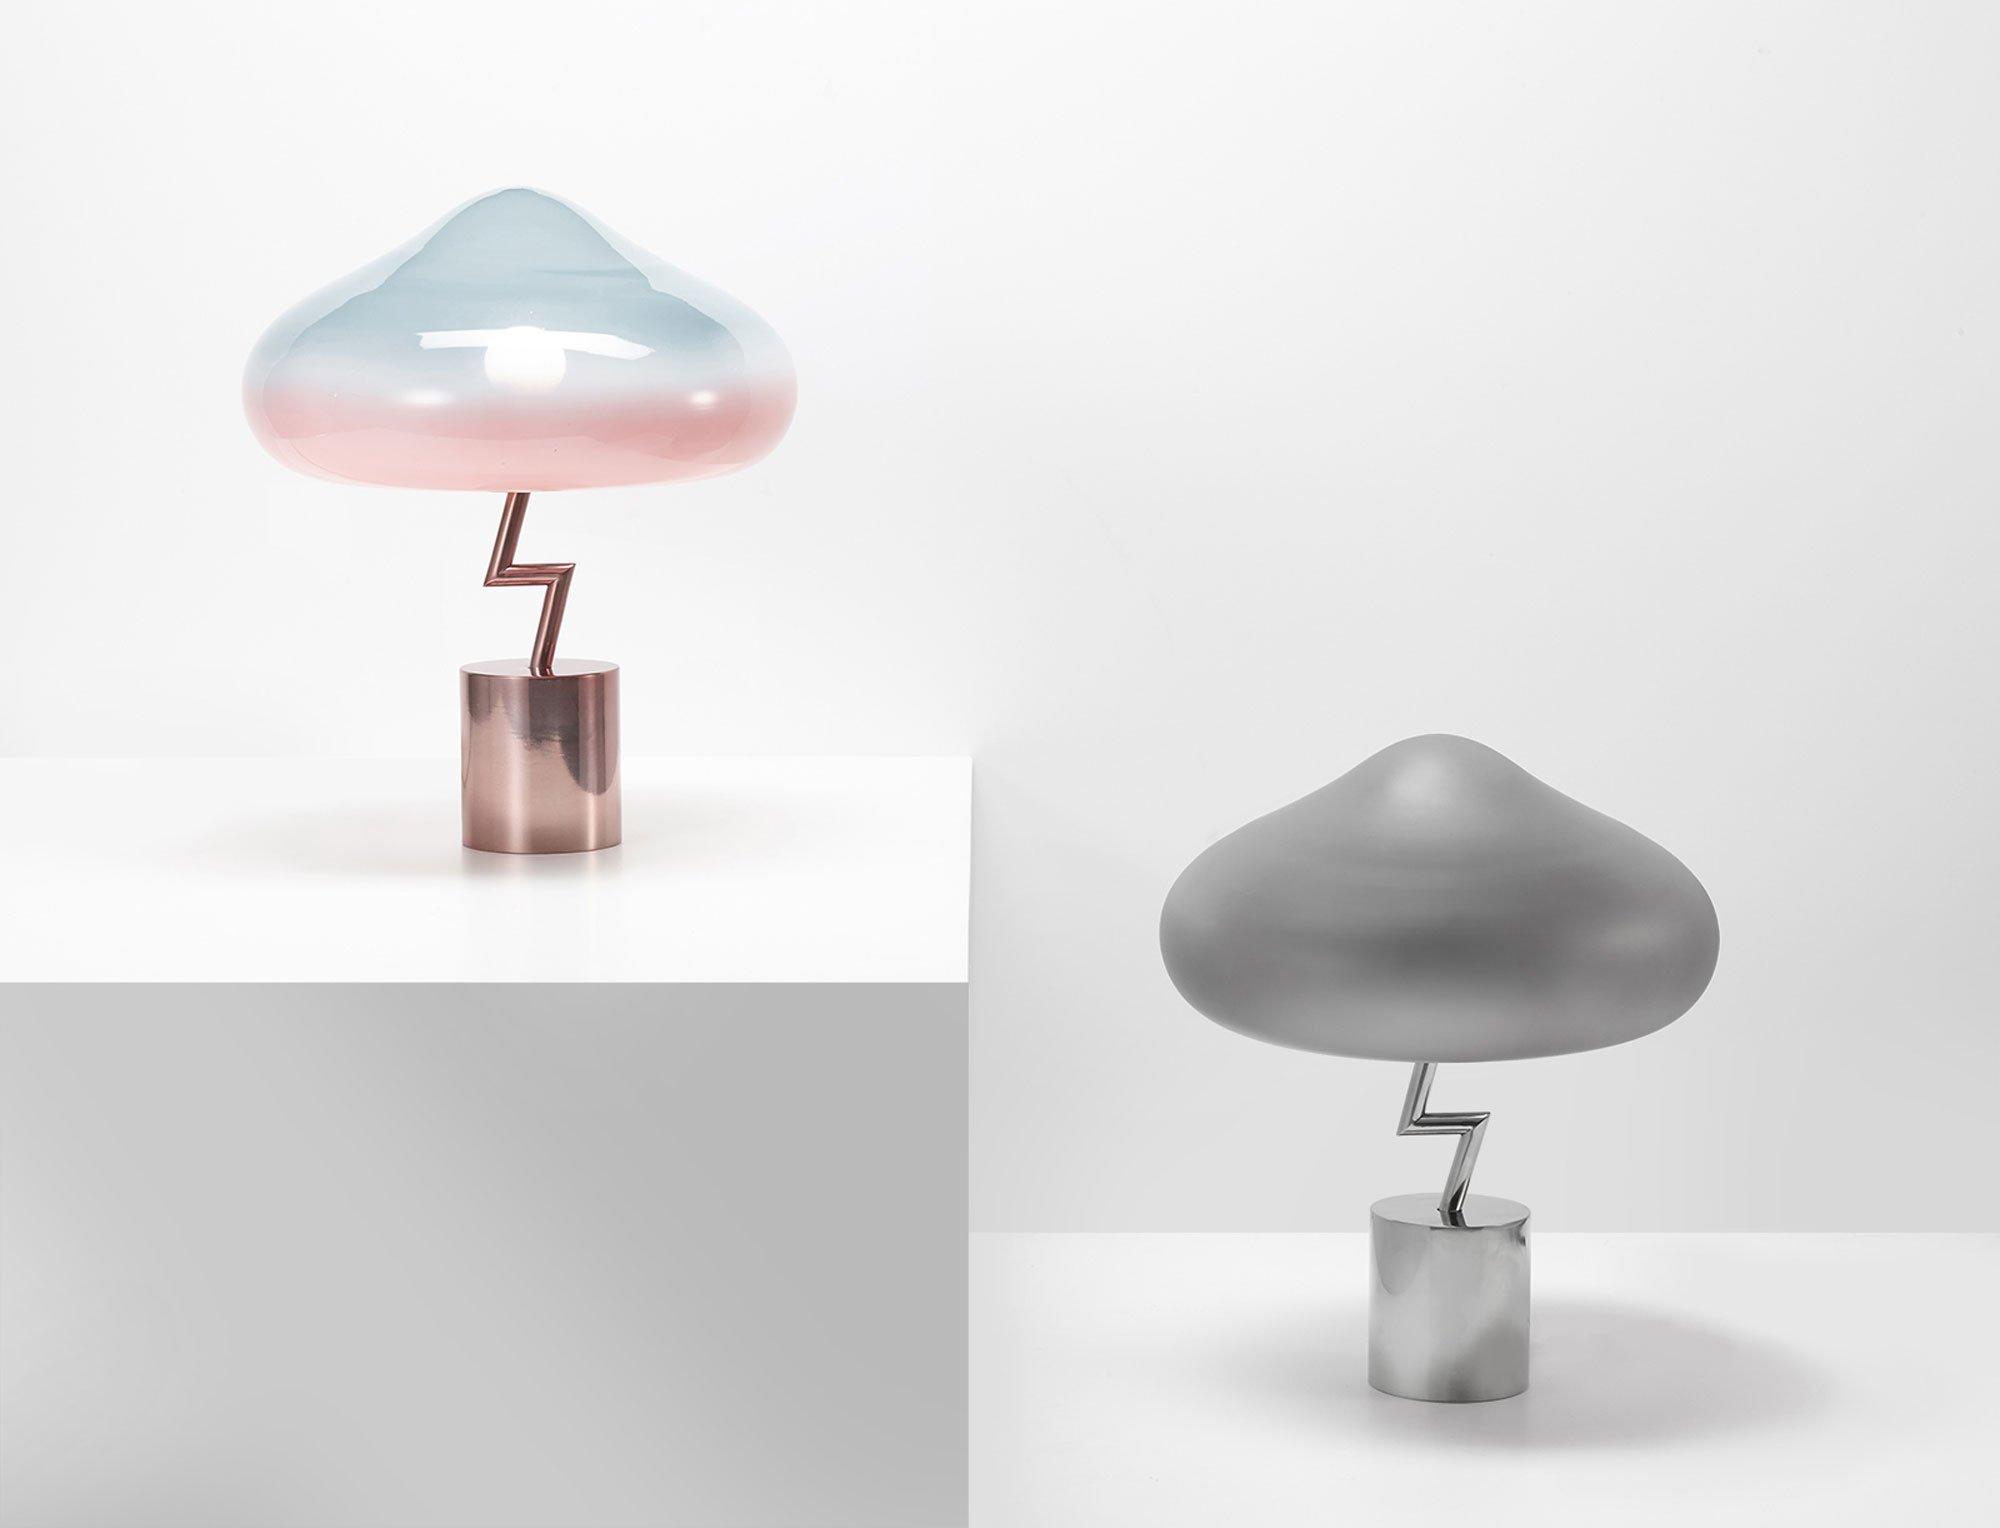 Creative Lighting Design The Lighting Lamp By Jiyoun Kim